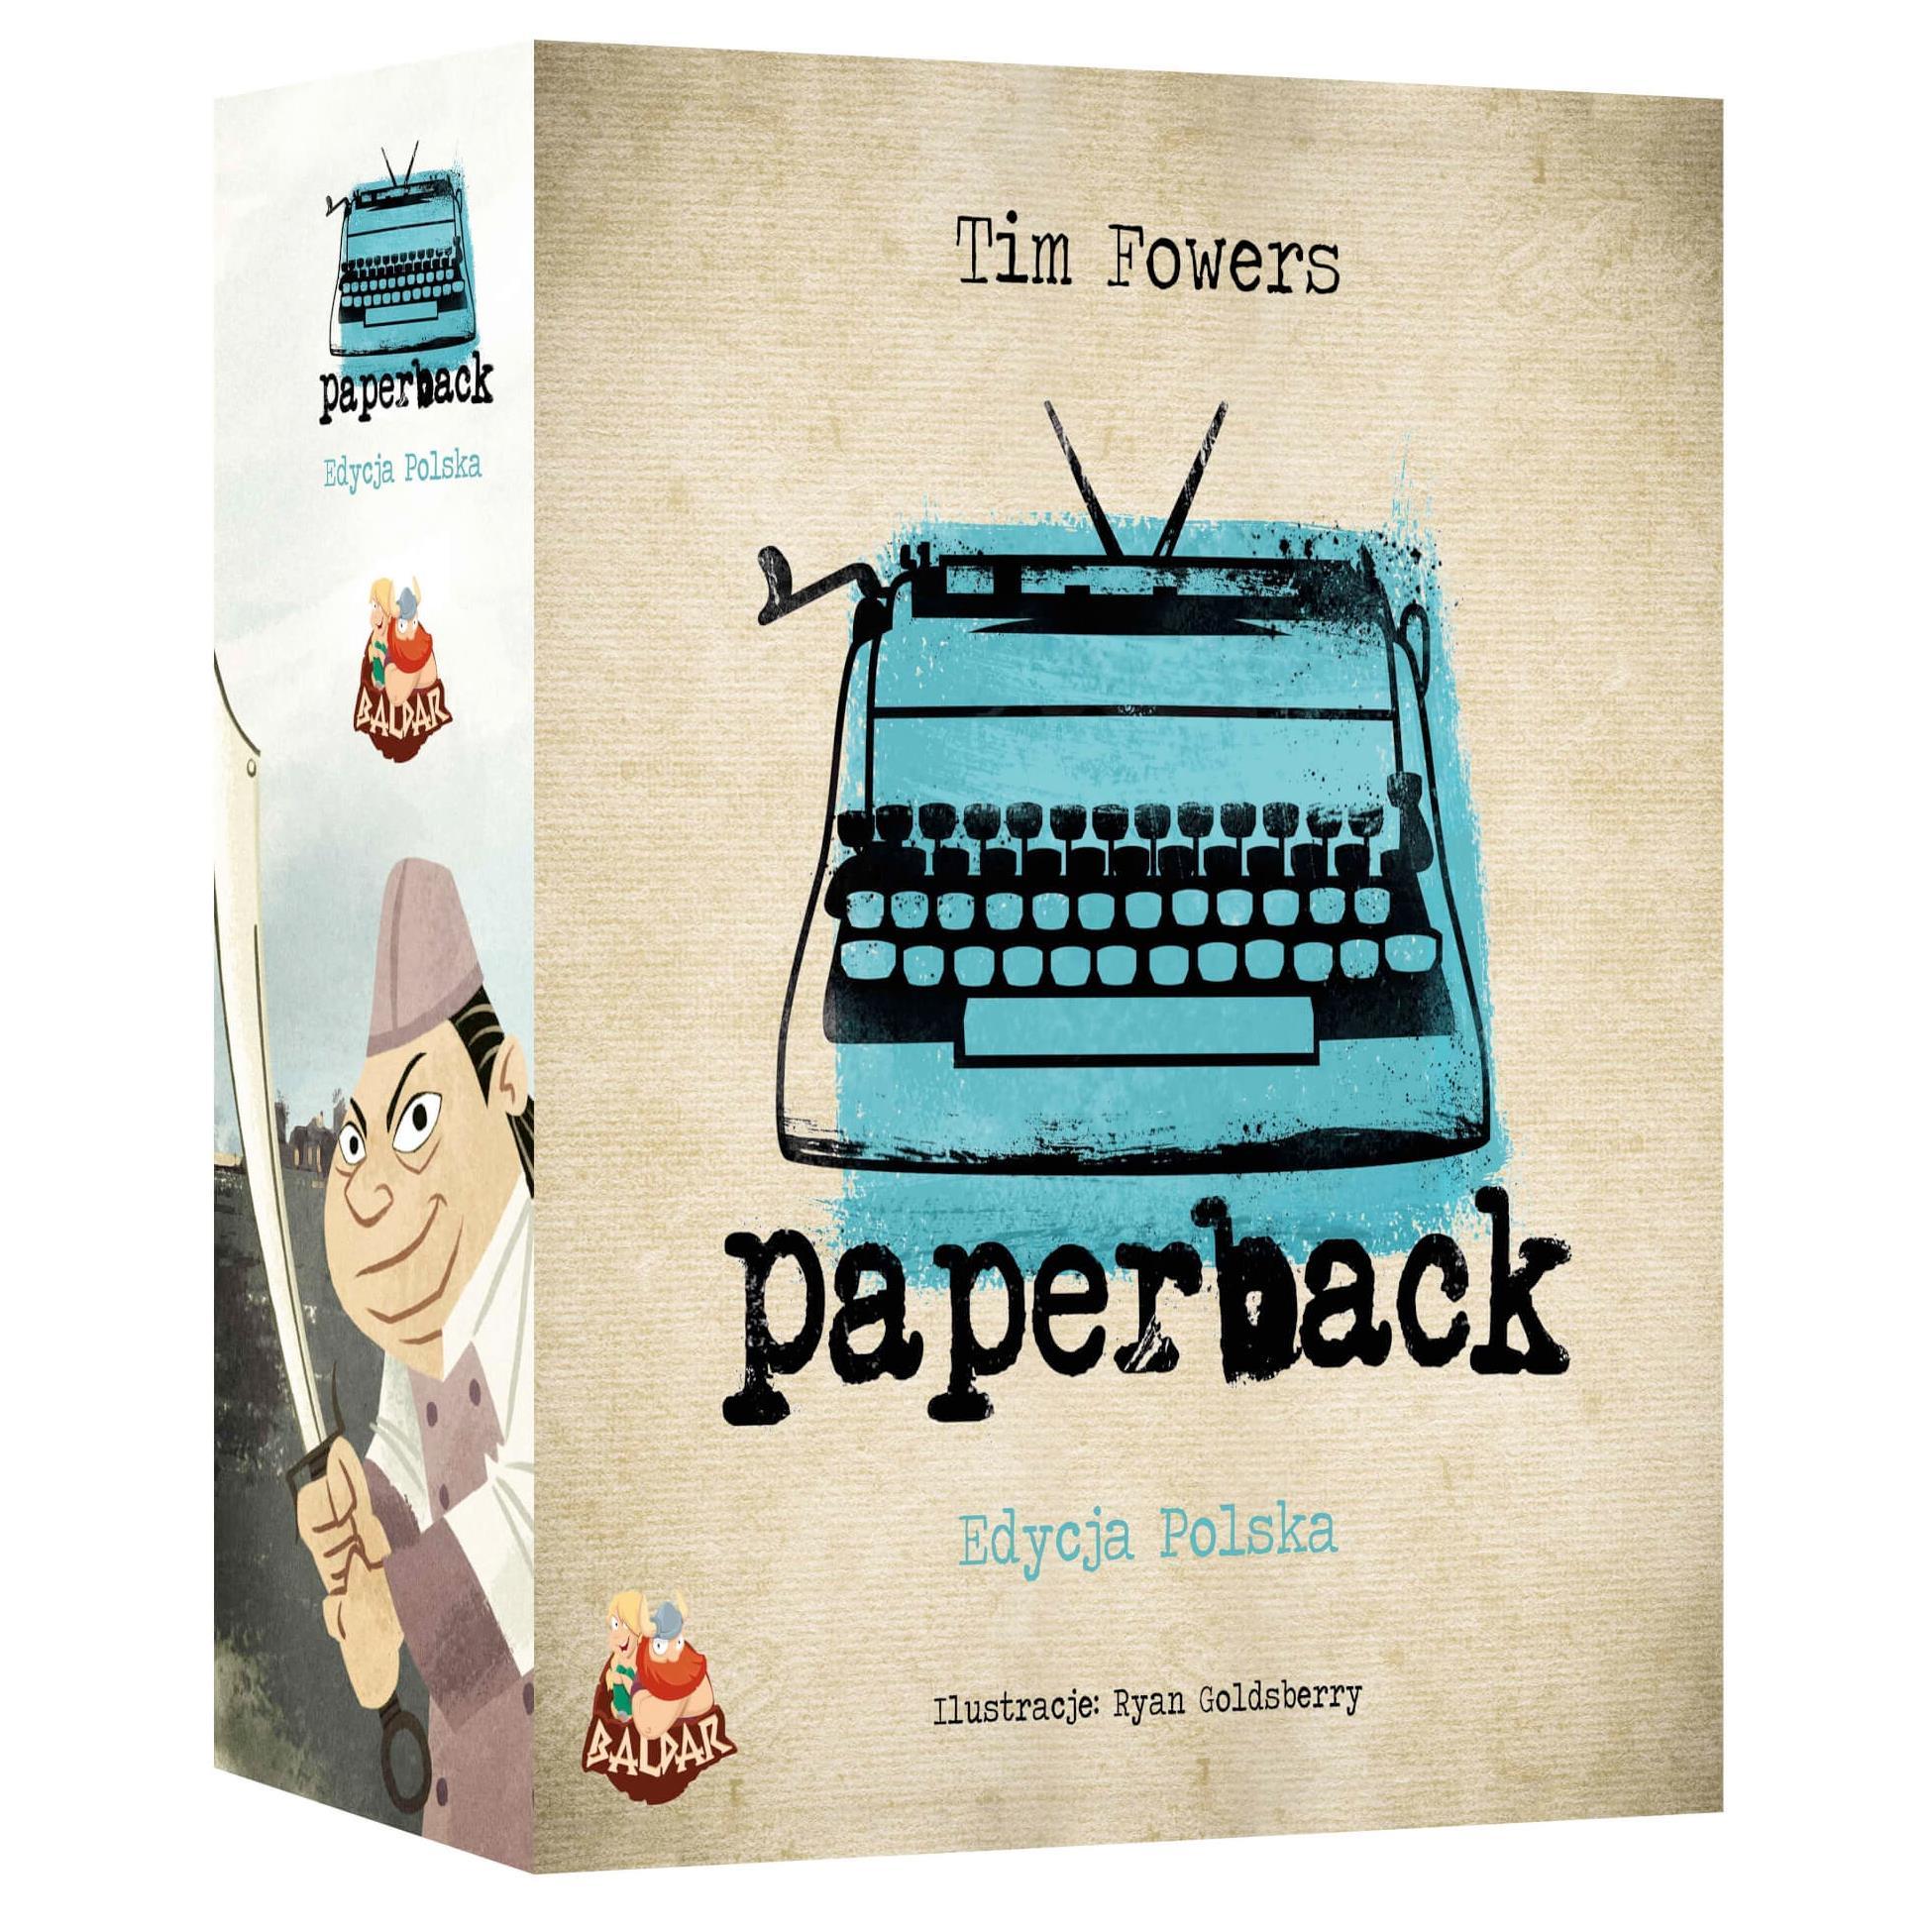 Paperback. Edycja Polska